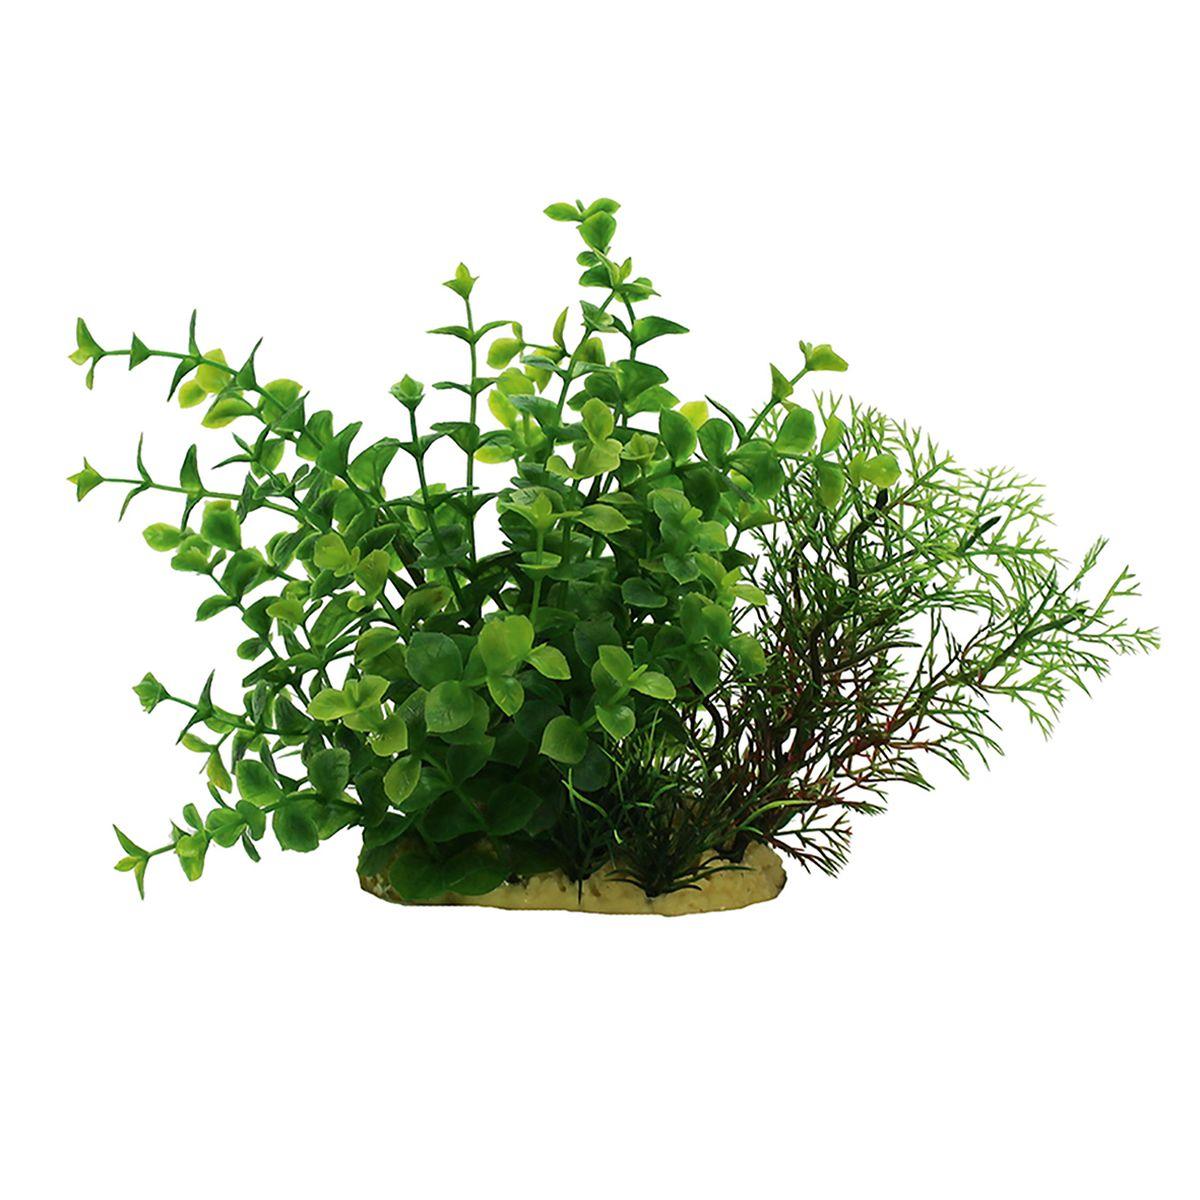 Растение для аквариума ArtUniq Людвигия зеленая, высота 15 смART-1140108Растение для аквариума ArtUniq Людвигия зеленая, высота 15 см